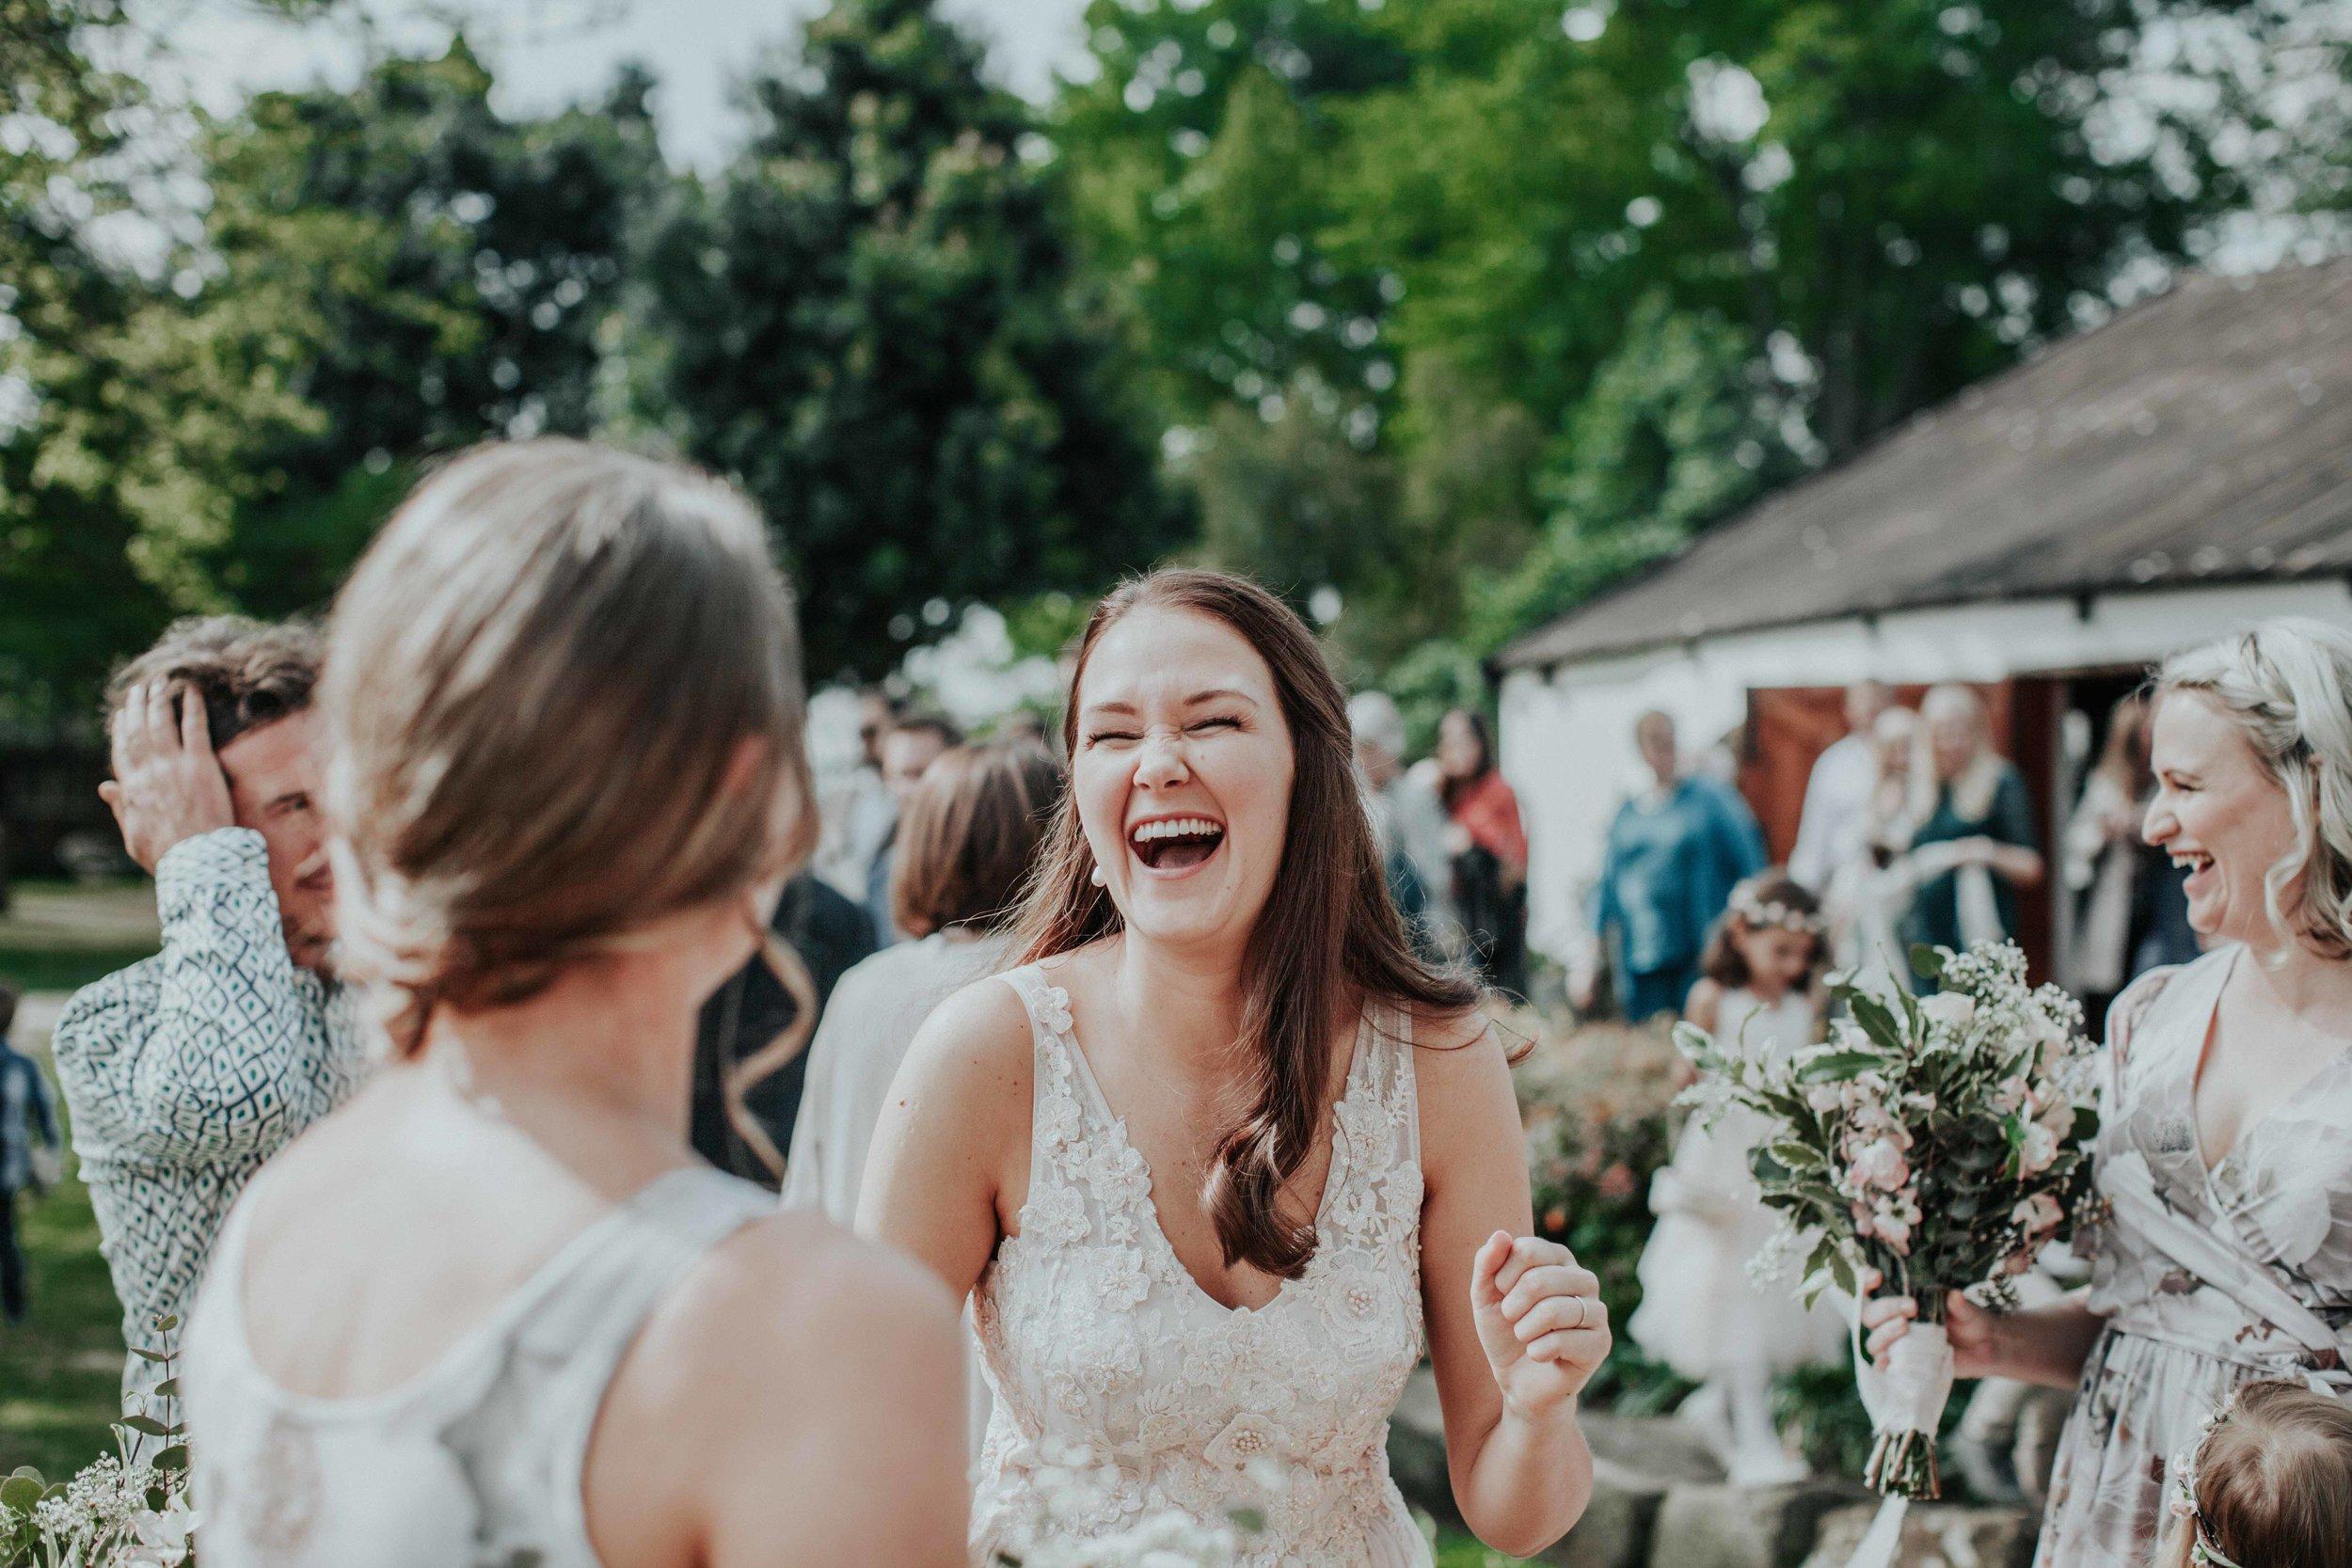 Kristi Smith Photography - Wedding Photographer - Kev and Kirst 6.jpg